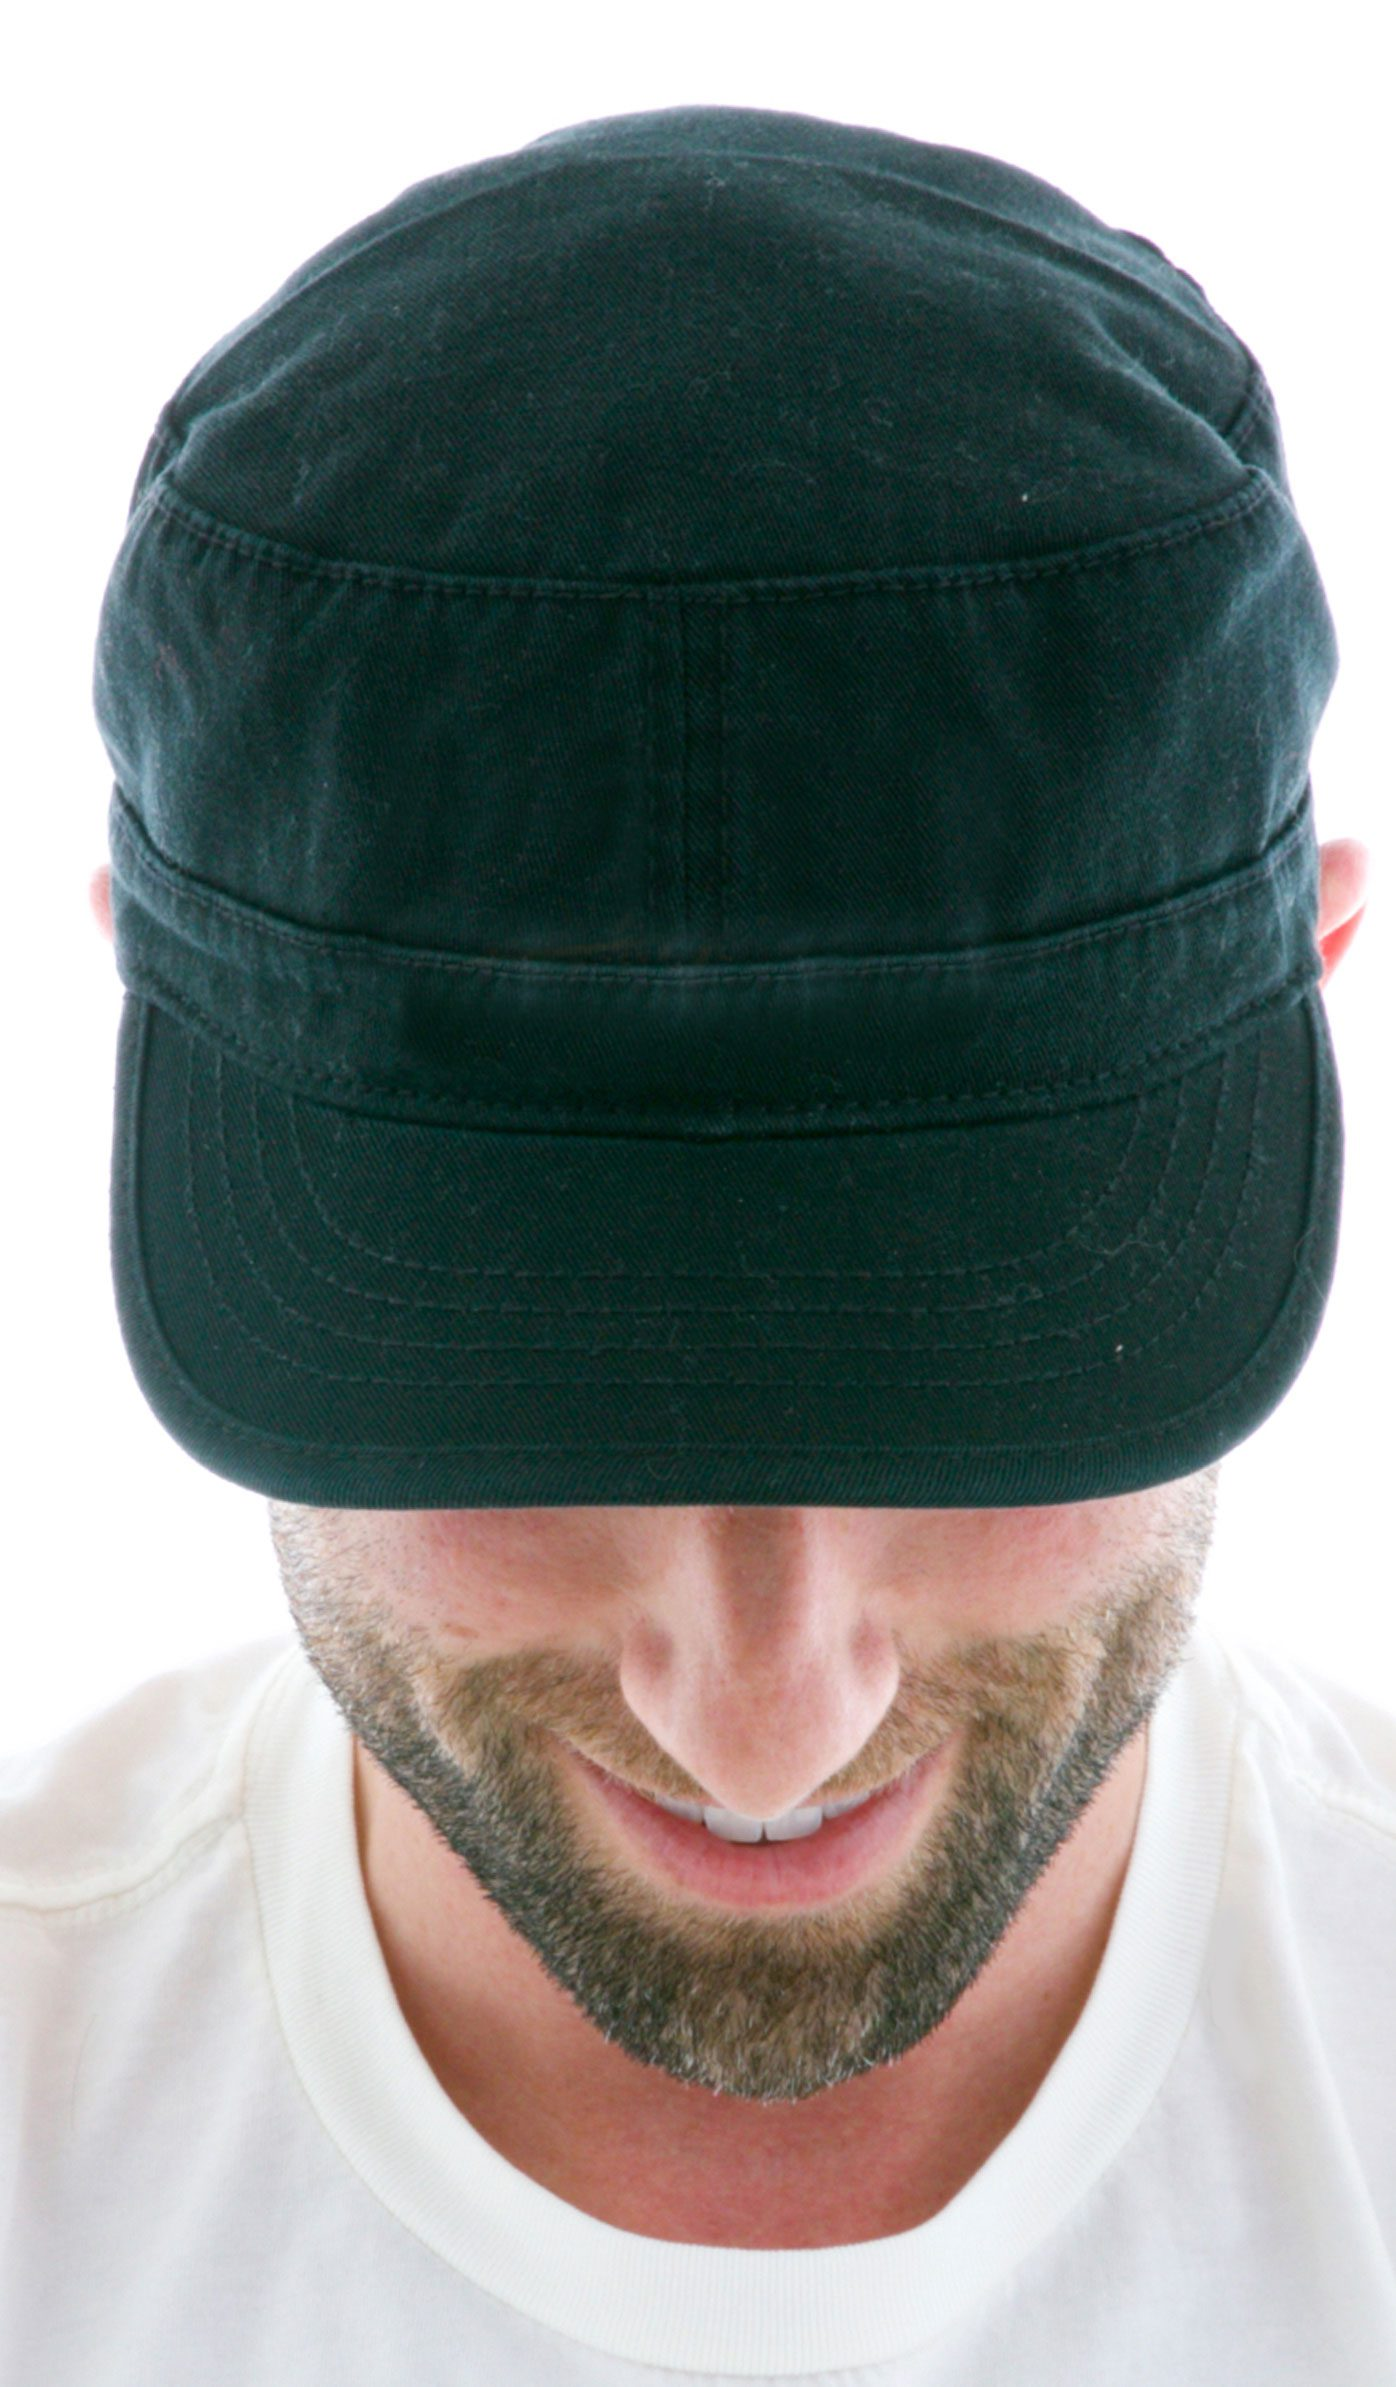 GG 858 Military Cap Headon